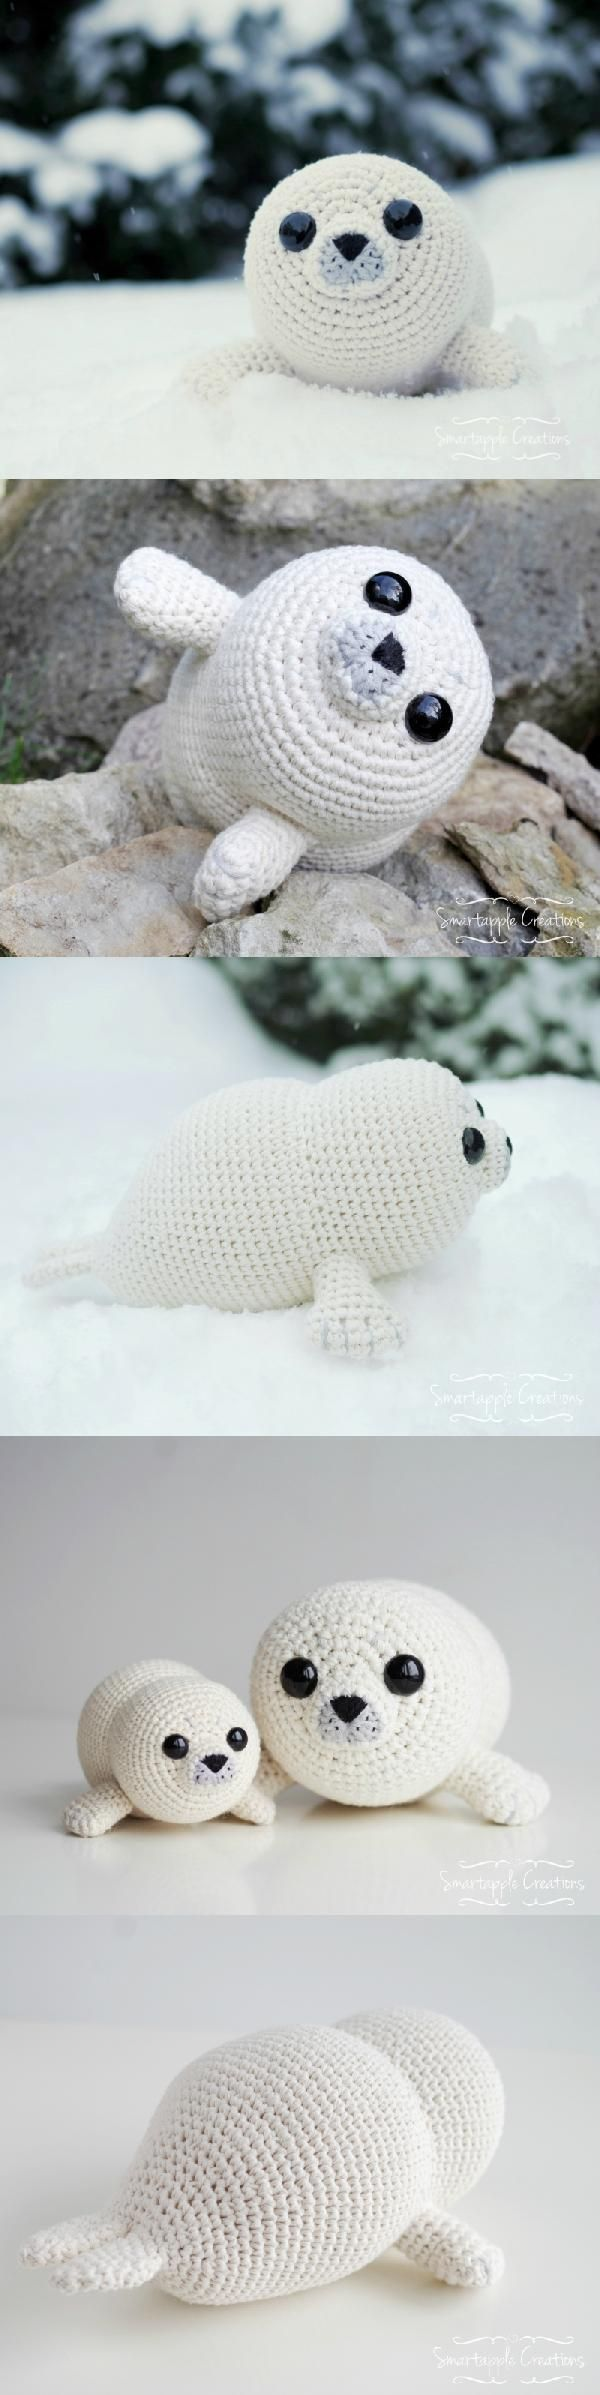 Bubbly The Baby Seal Amigurumi Pattern